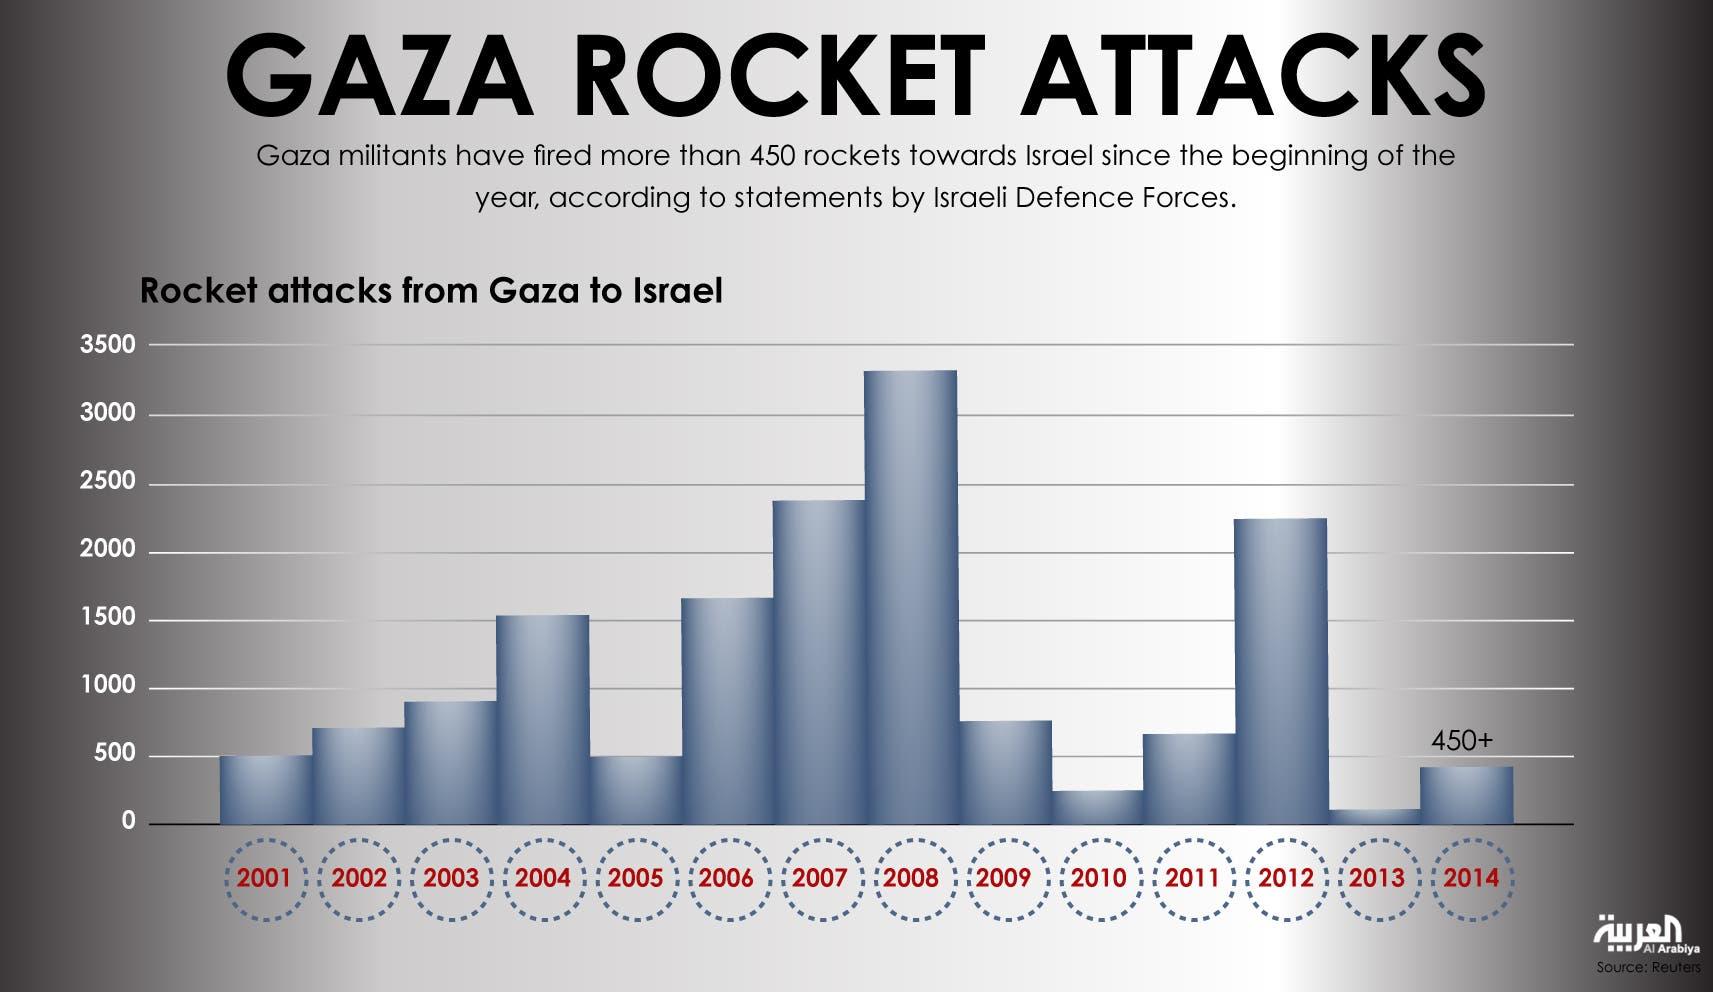 Infographic: Gaza rocket attacks